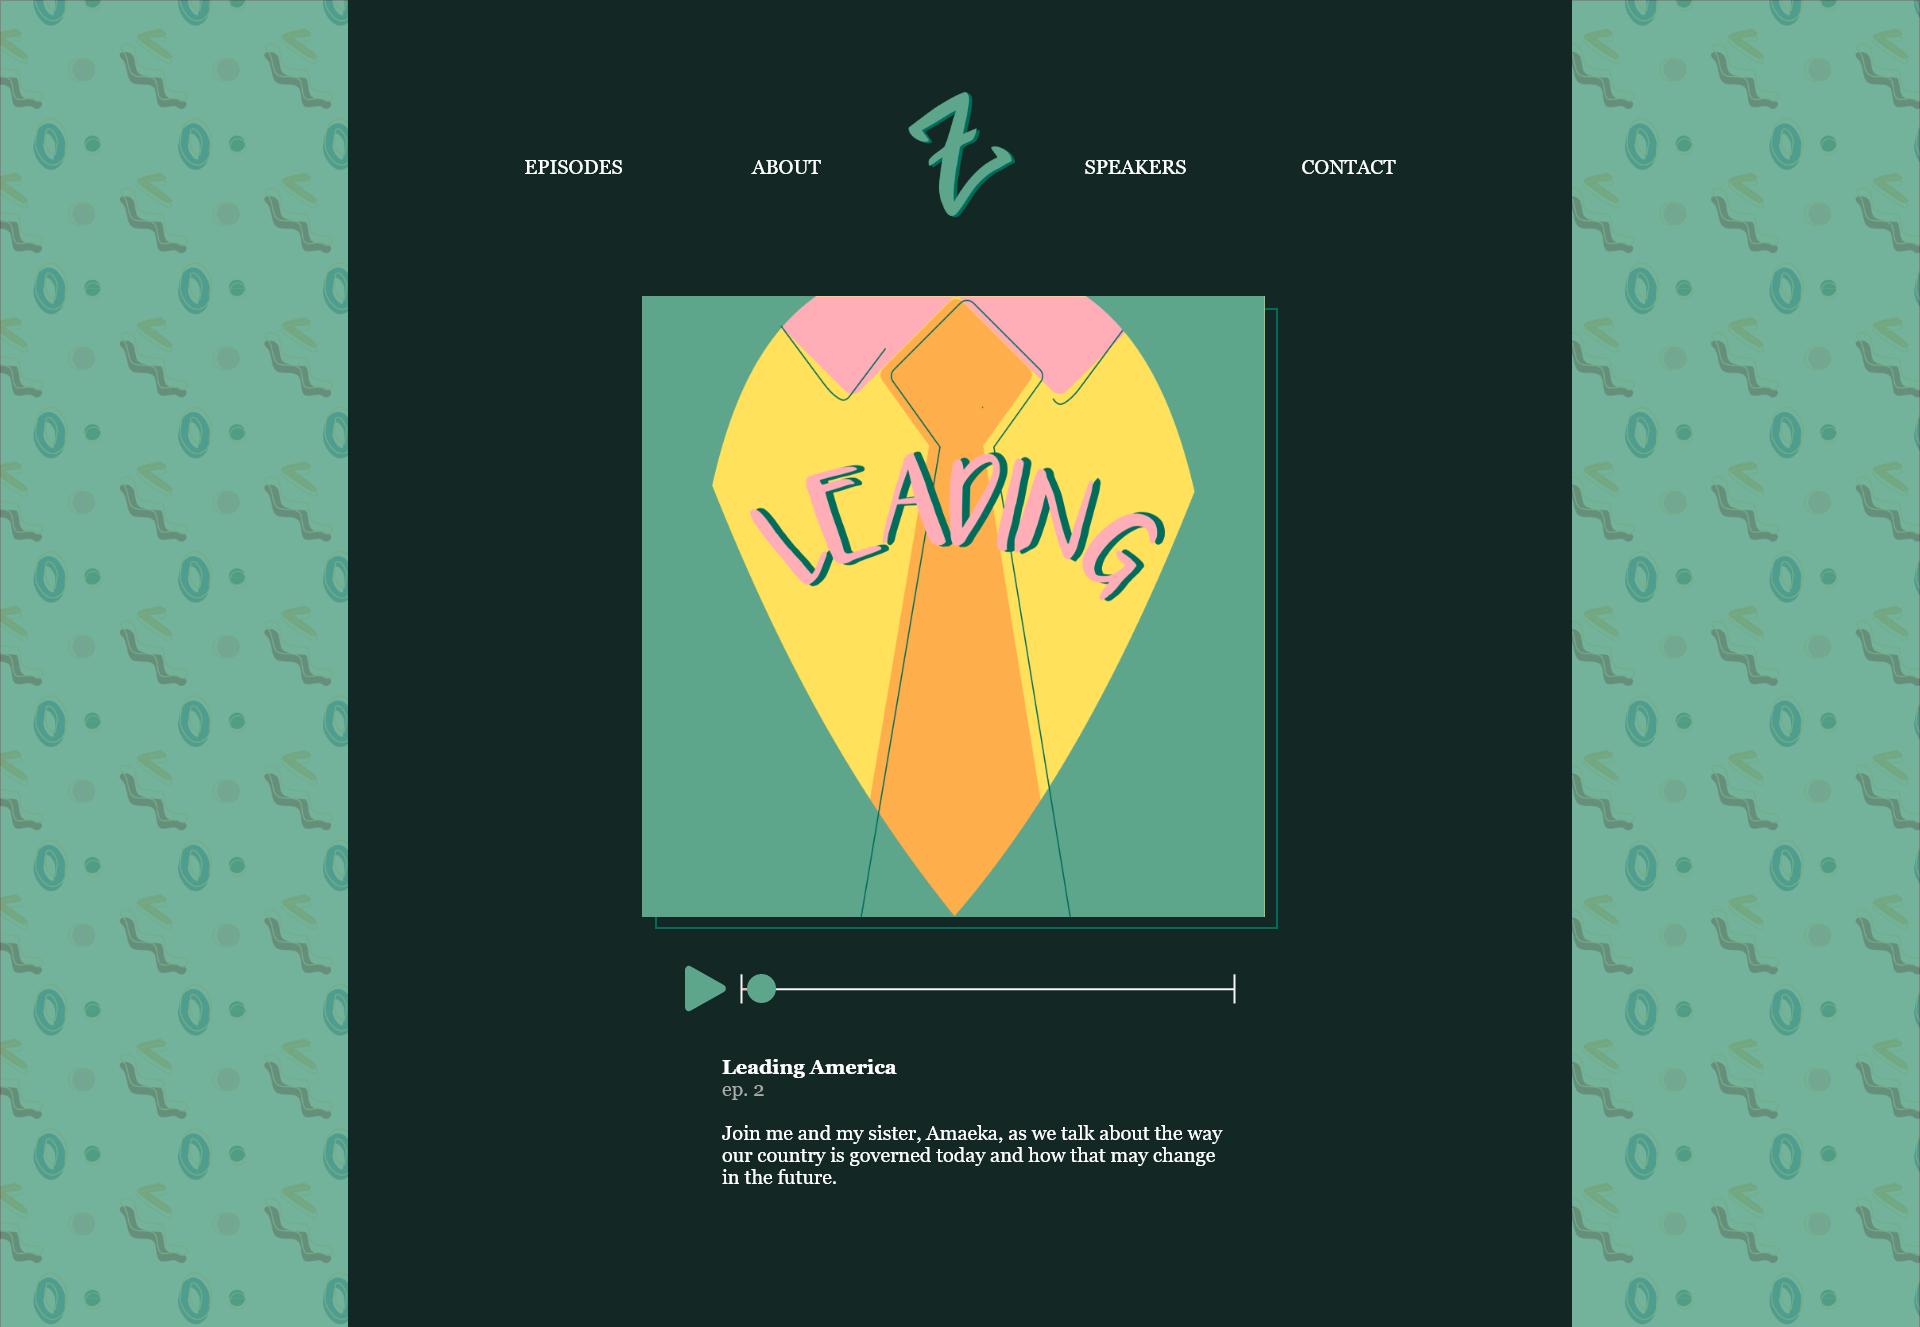 Landing Page - Episodes – 2